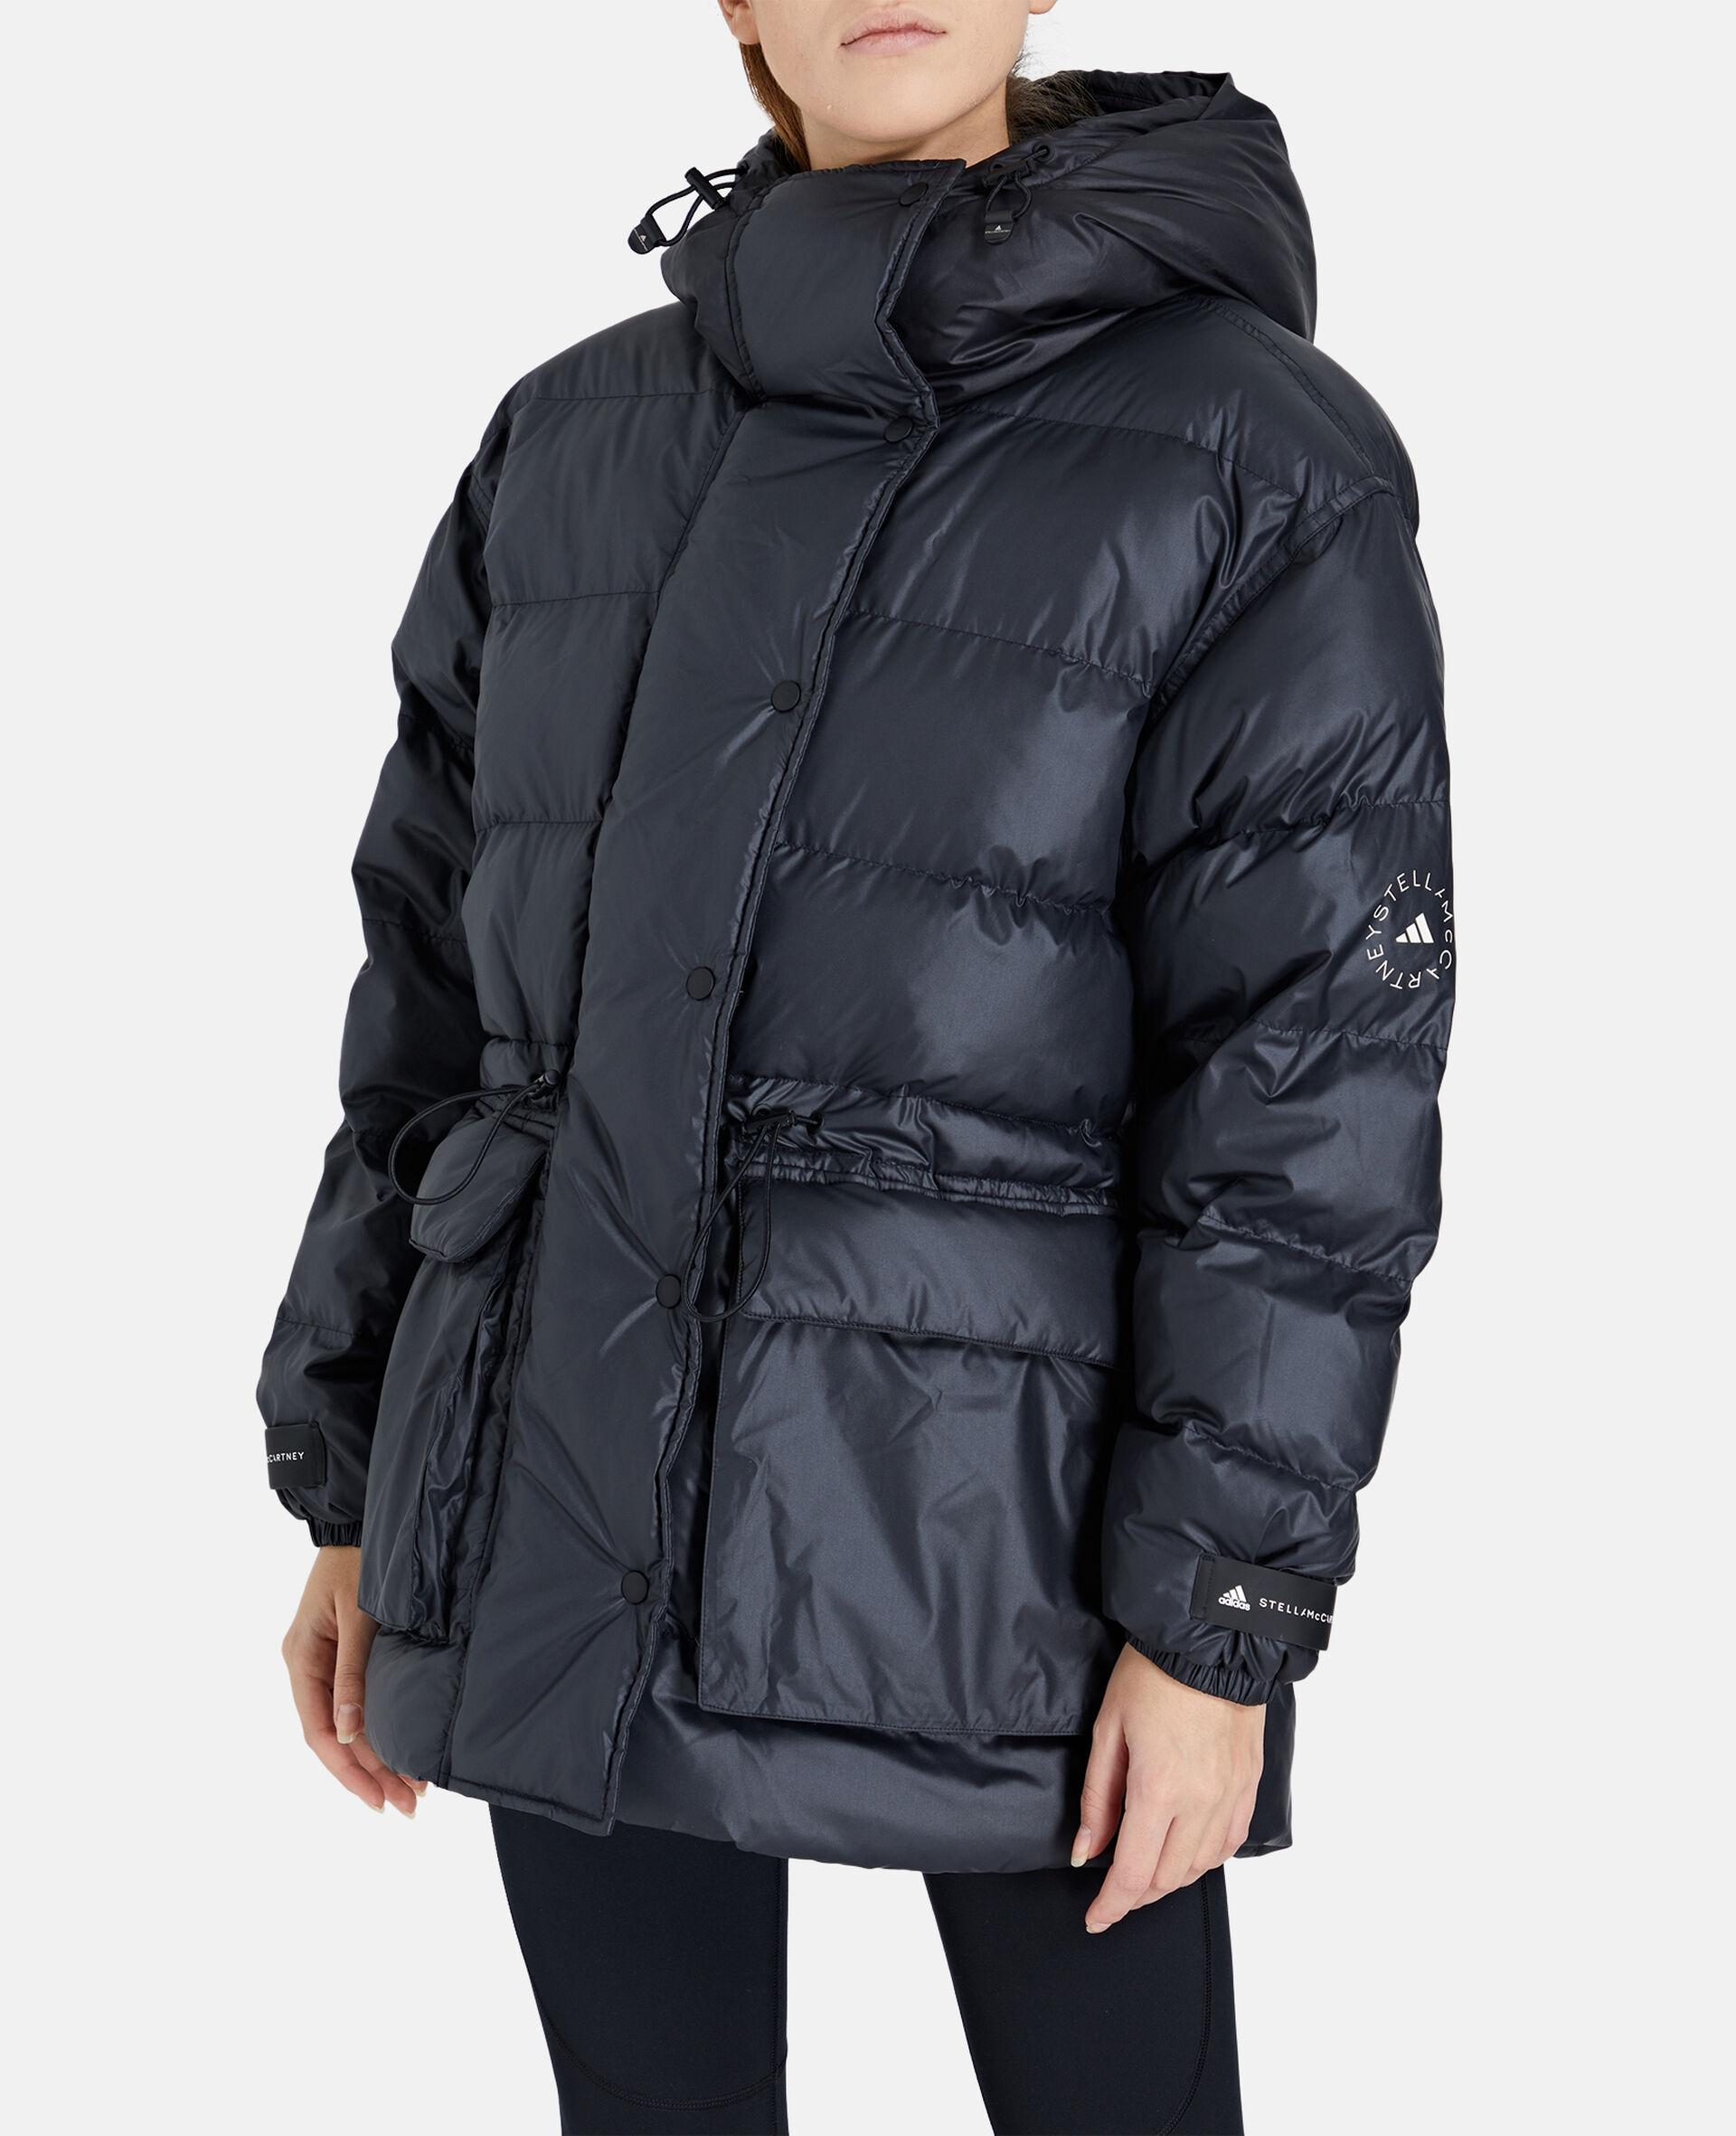 2 合 1 中长款衬垫夹克-黑色-large image number 4